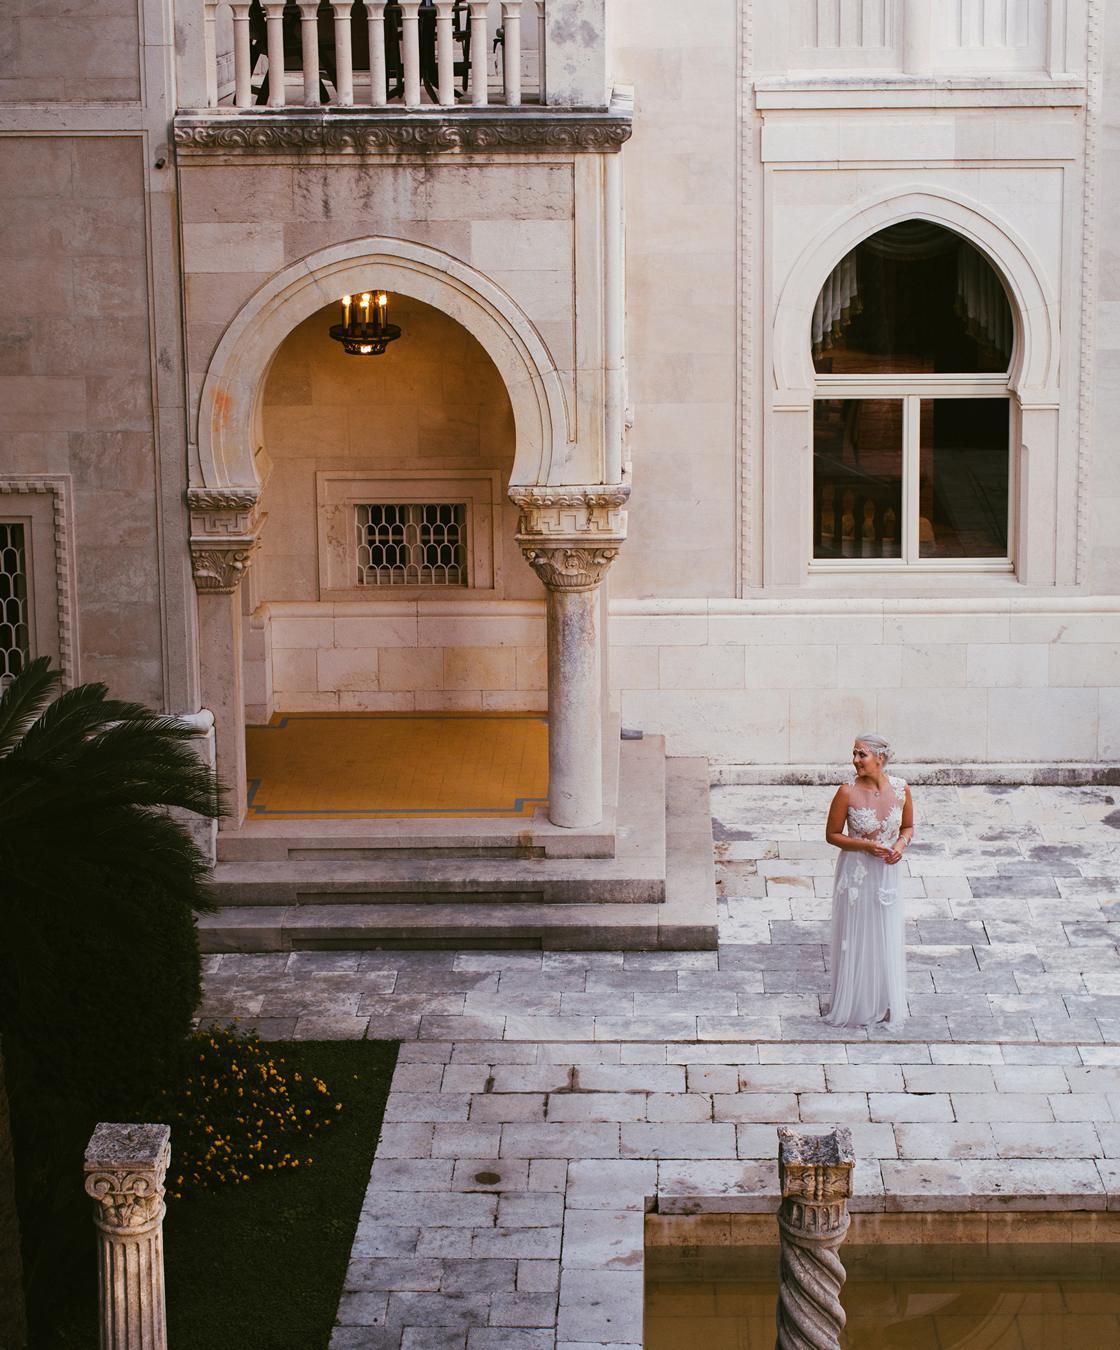 dubrovnik-wedding-photographer-croatia-destination-weddings-jenna-rich067